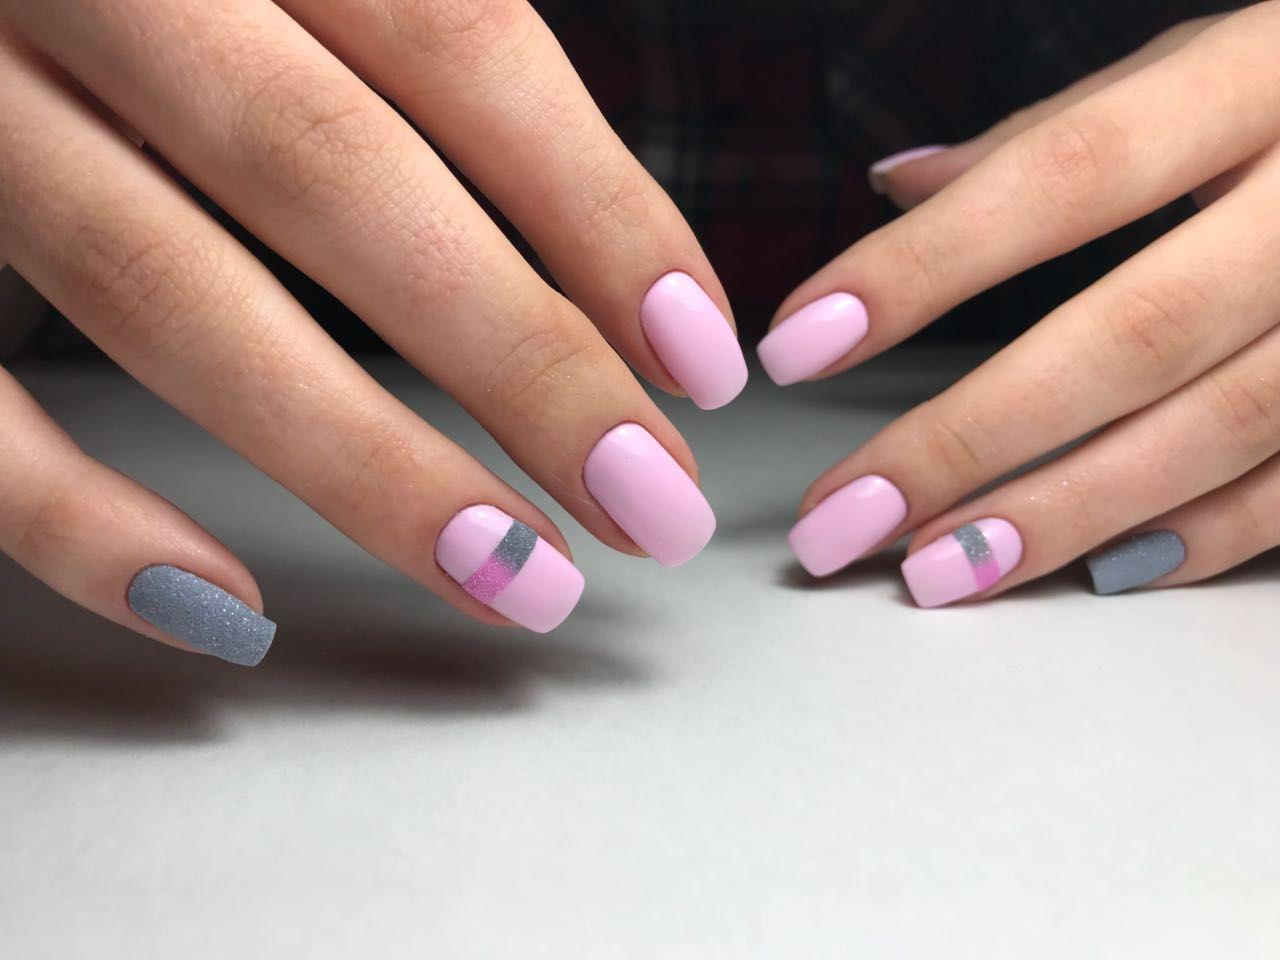 Маникюр - дизайн ногтей   VK   Маникюр in 25   Ногти ...